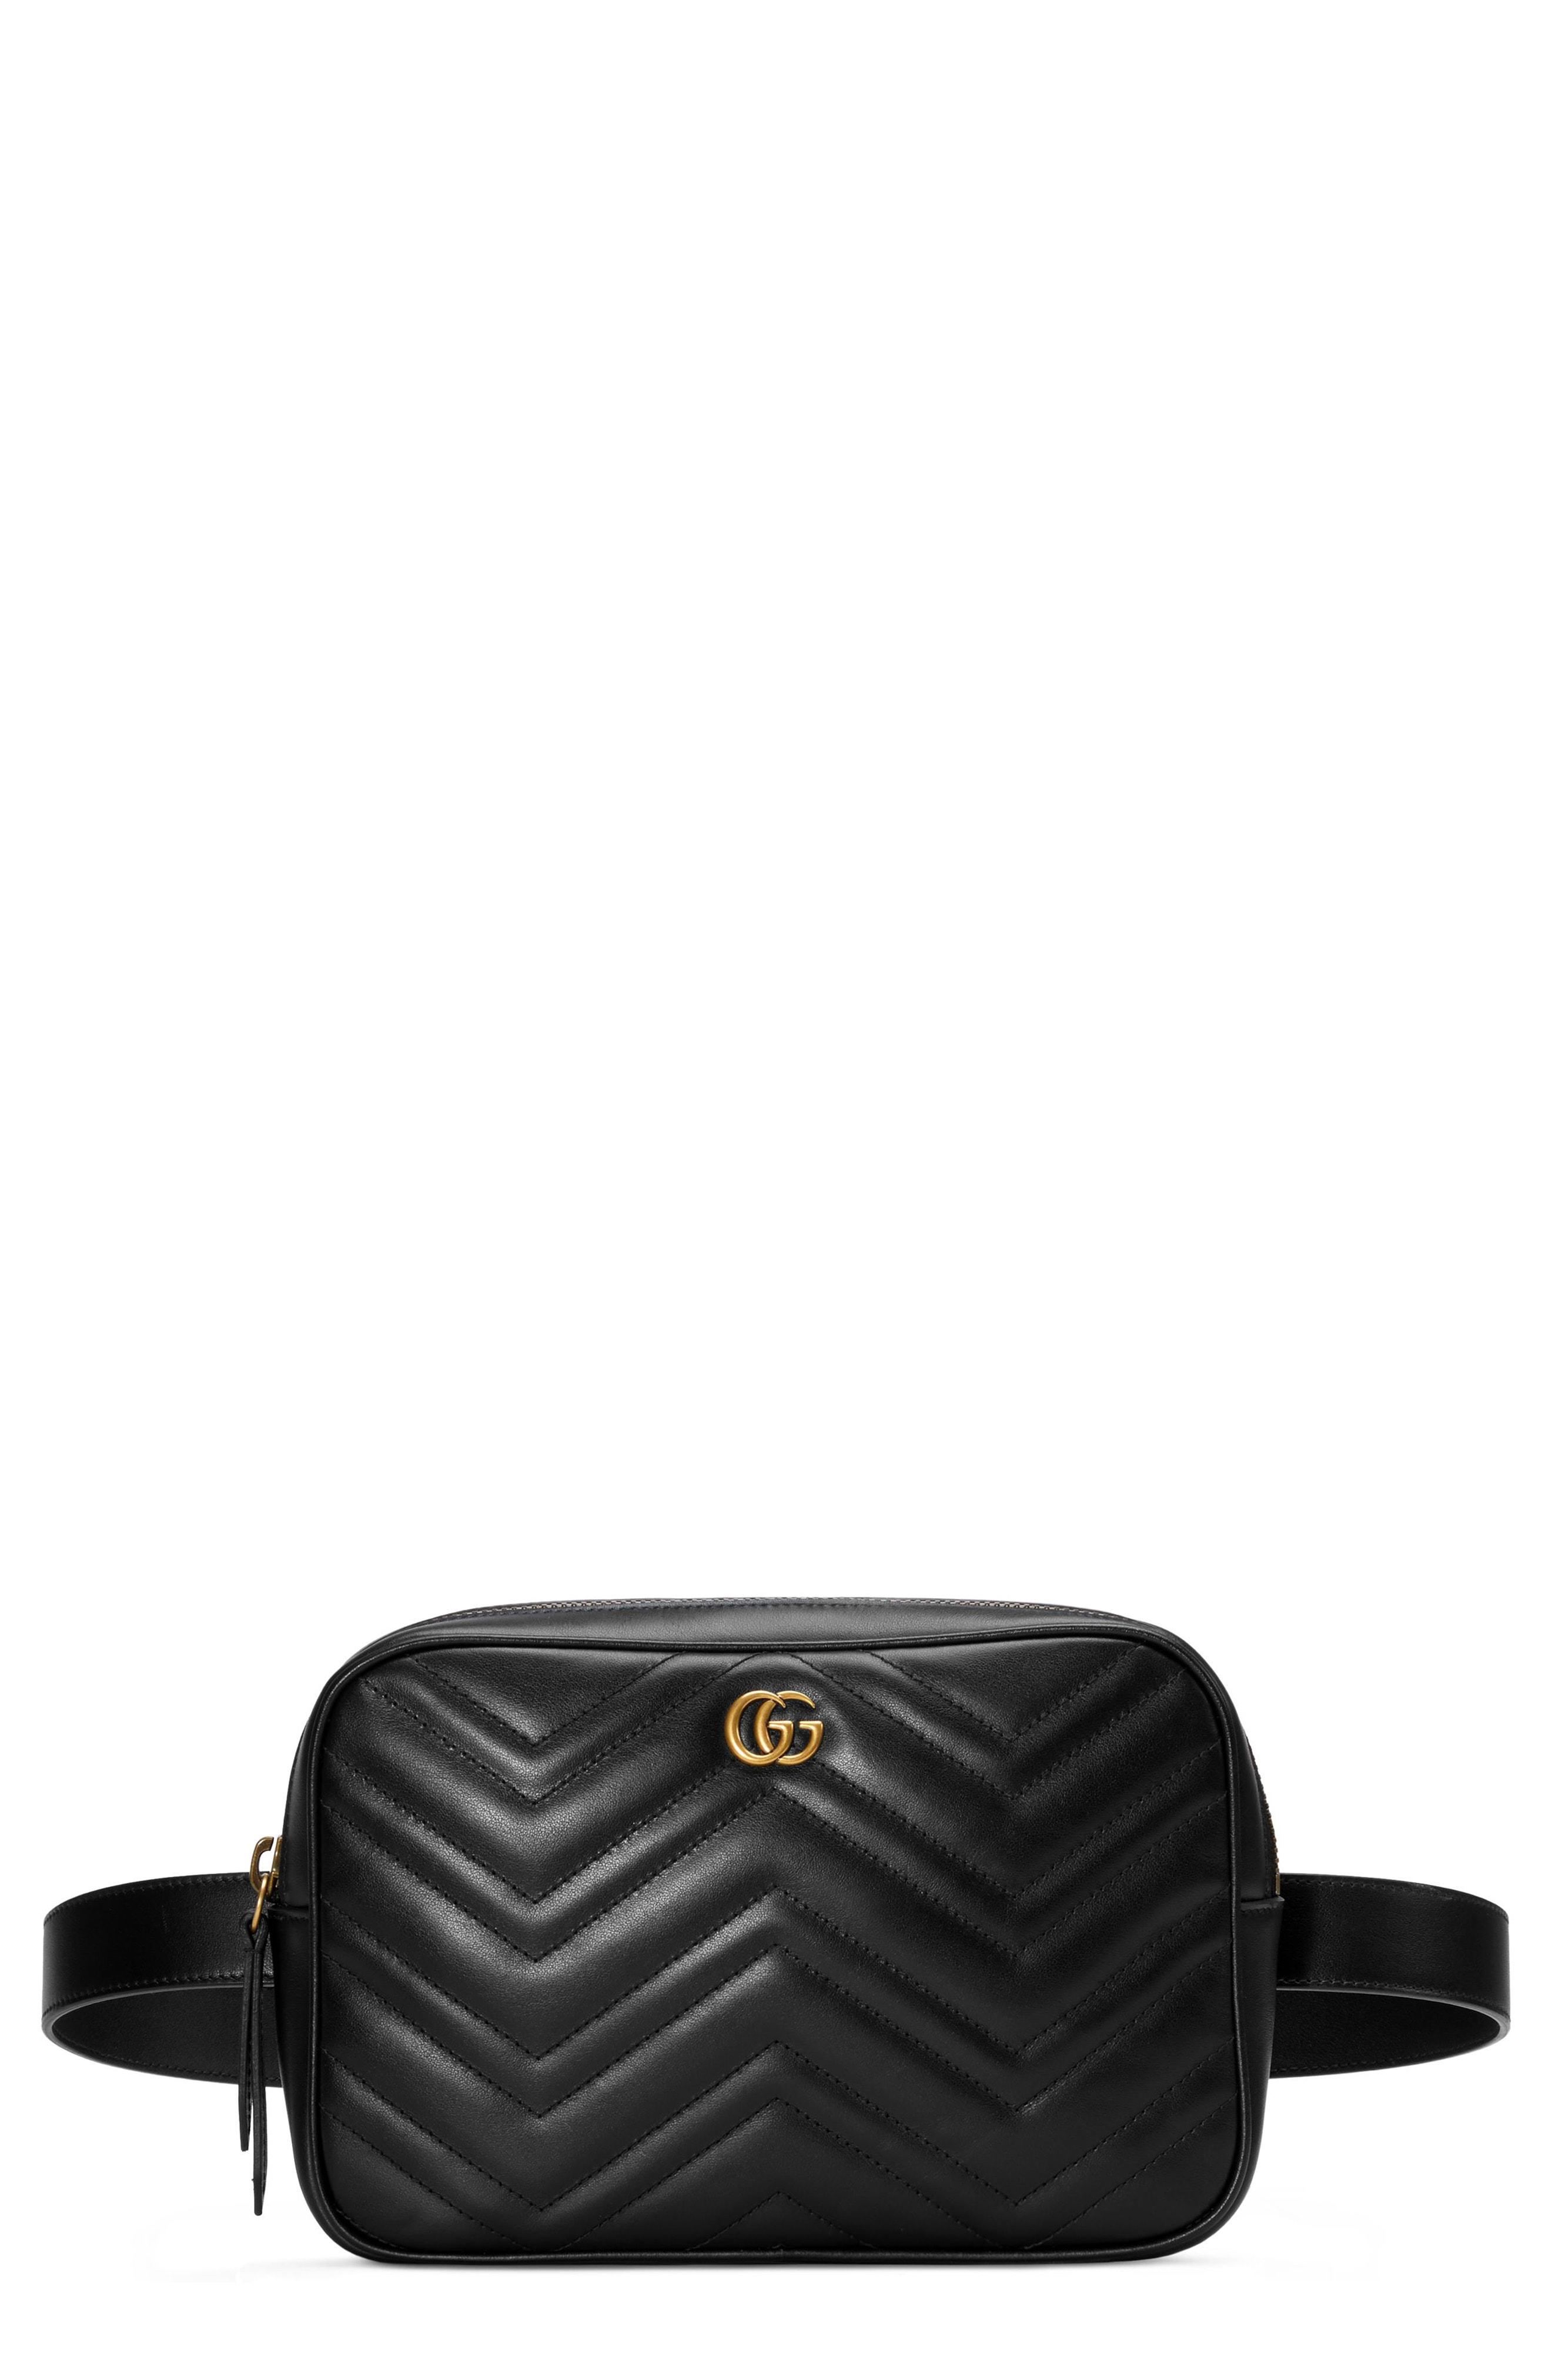 72e2998977d303 Men's Gucci Gg Marmont 2.0 Matelasse Convertible Leather Belt Bag – | The  Fashionisto